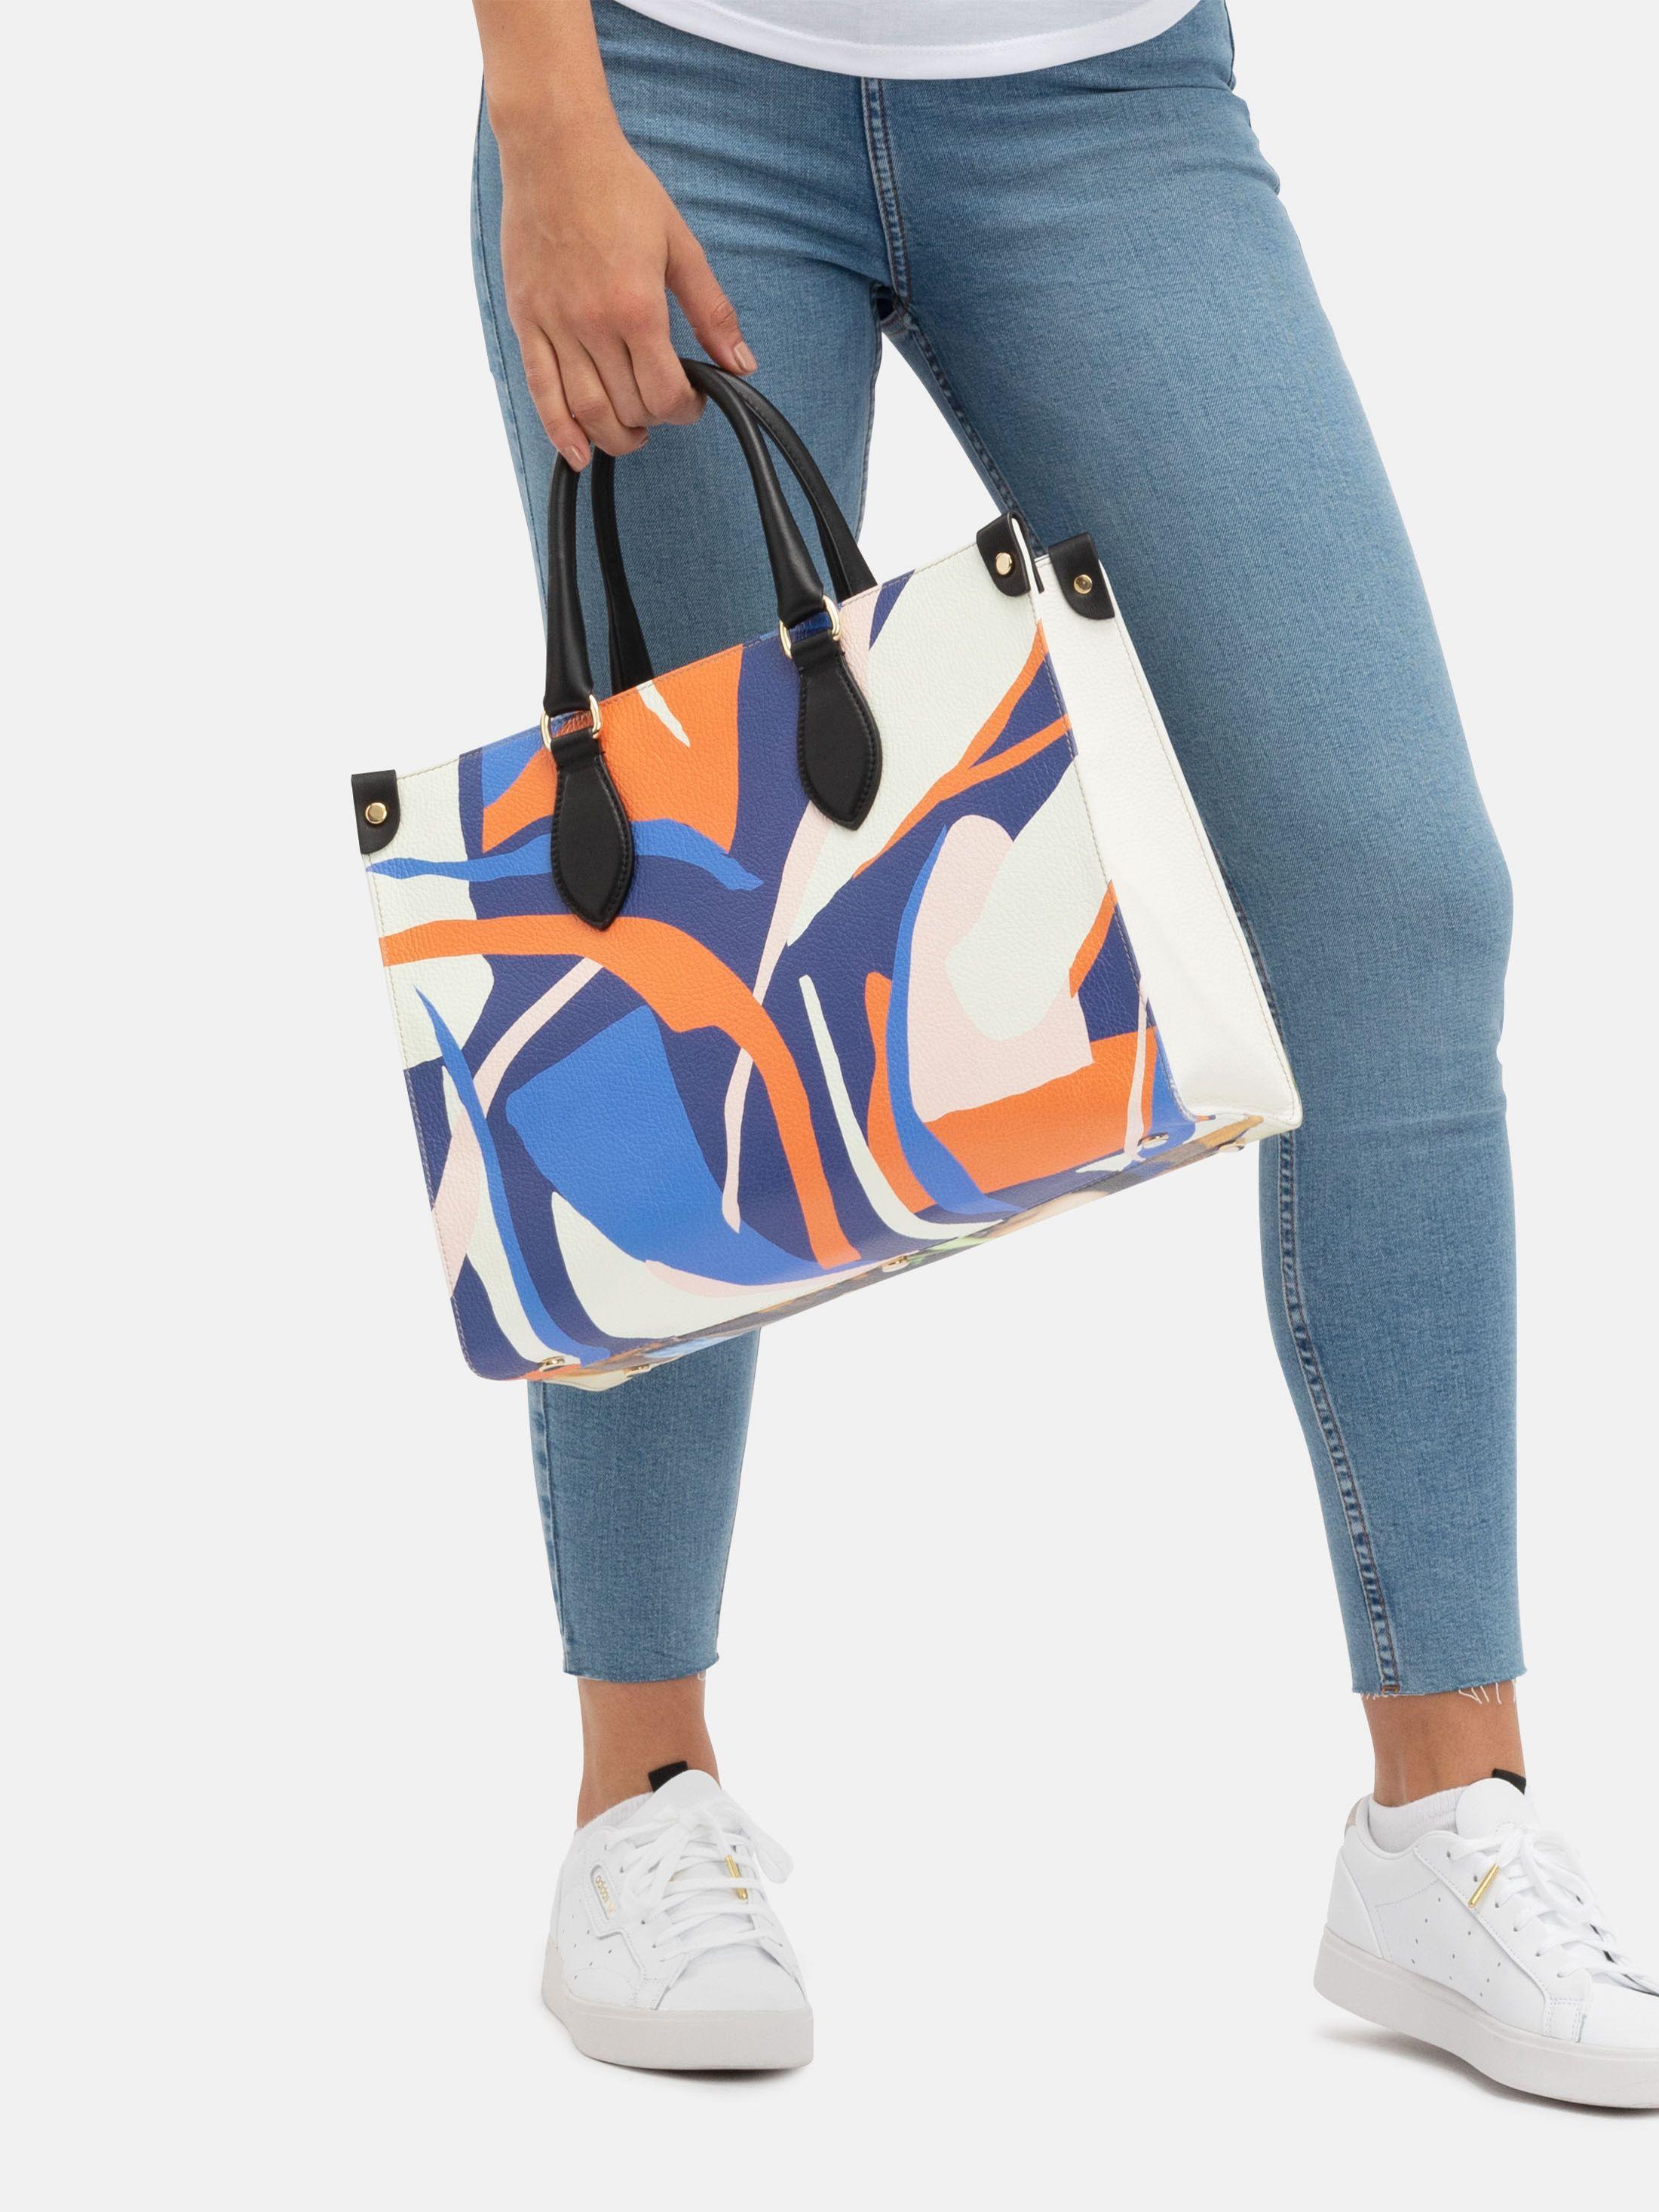 Shopping Bag selbst gestalten